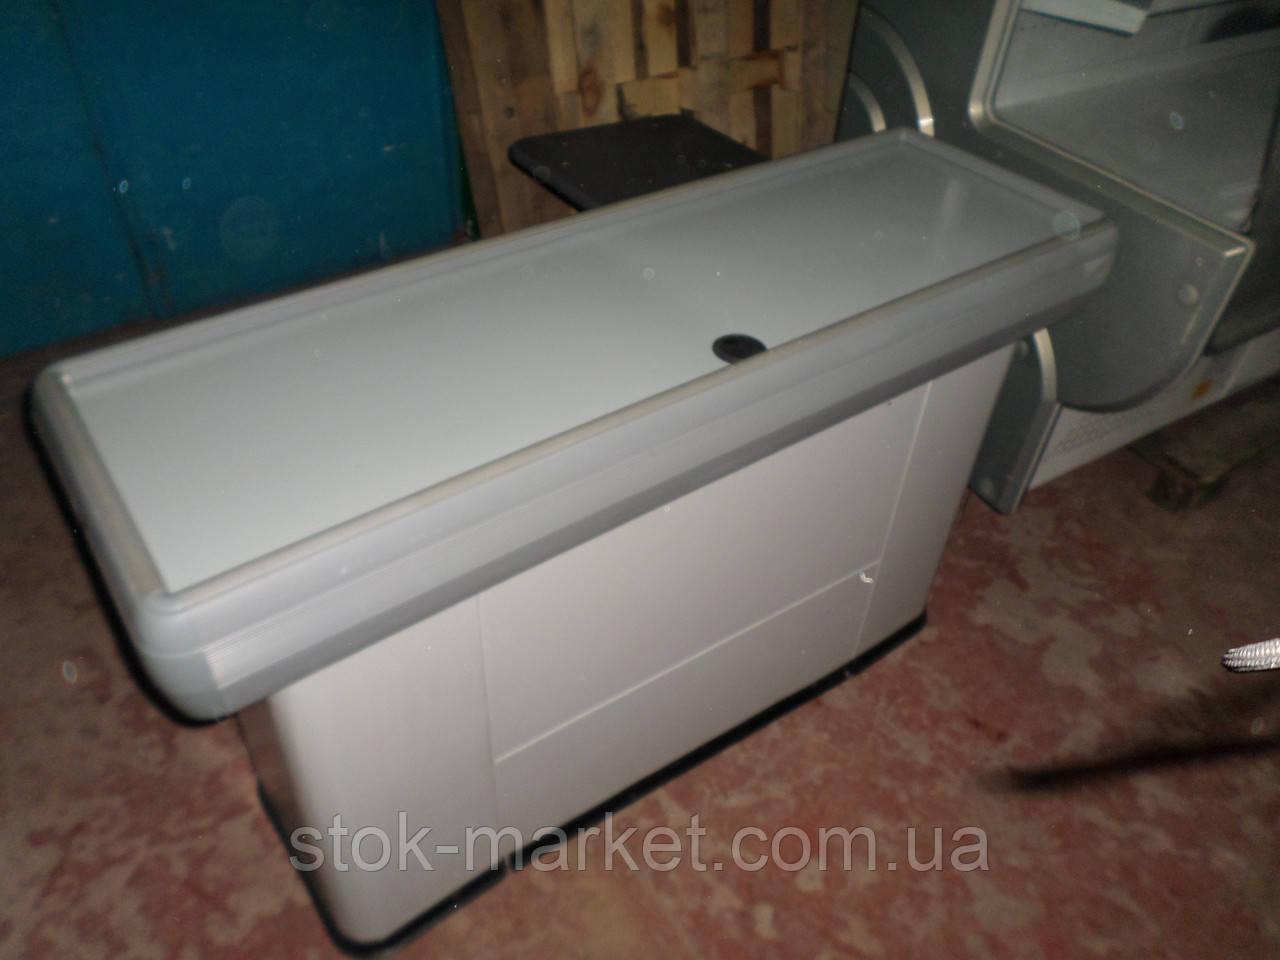 Кассовый бокс Кассовое место Modern-Expo КB 150 (Mini) без транспортера.